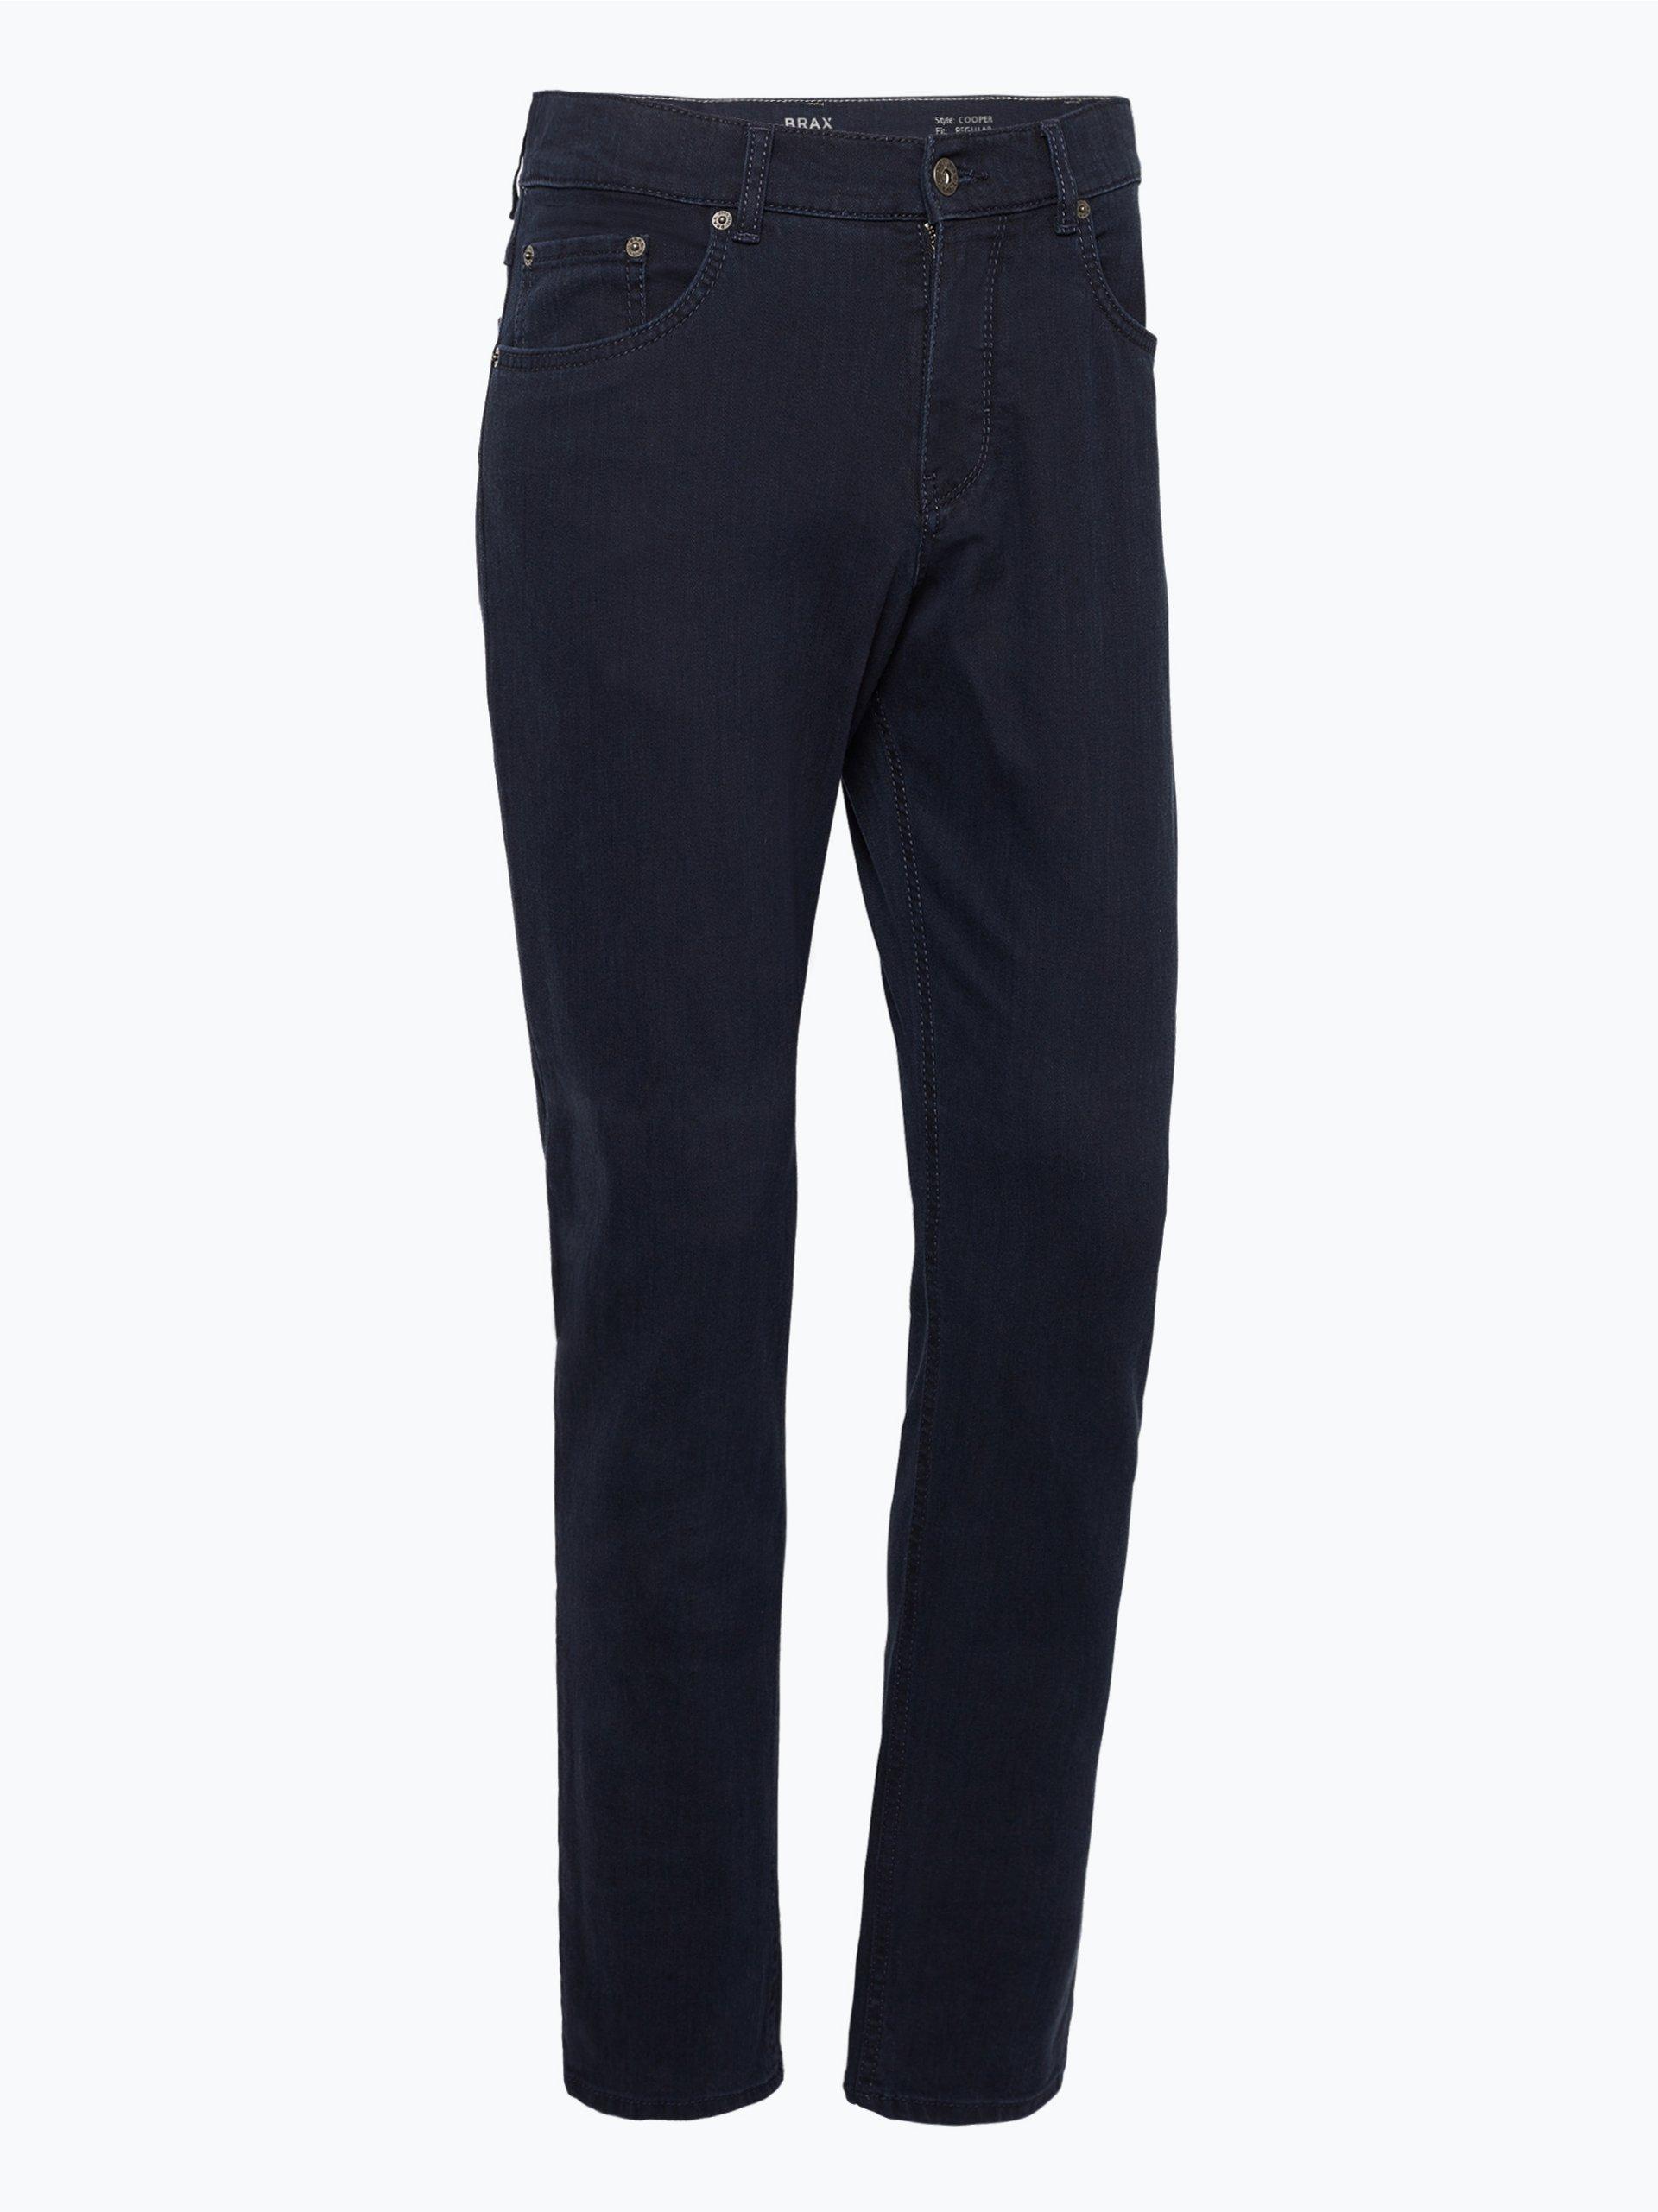 brax herren jeans cooper marine uni online kaufen. Black Bedroom Furniture Sets. Home Design Ideas